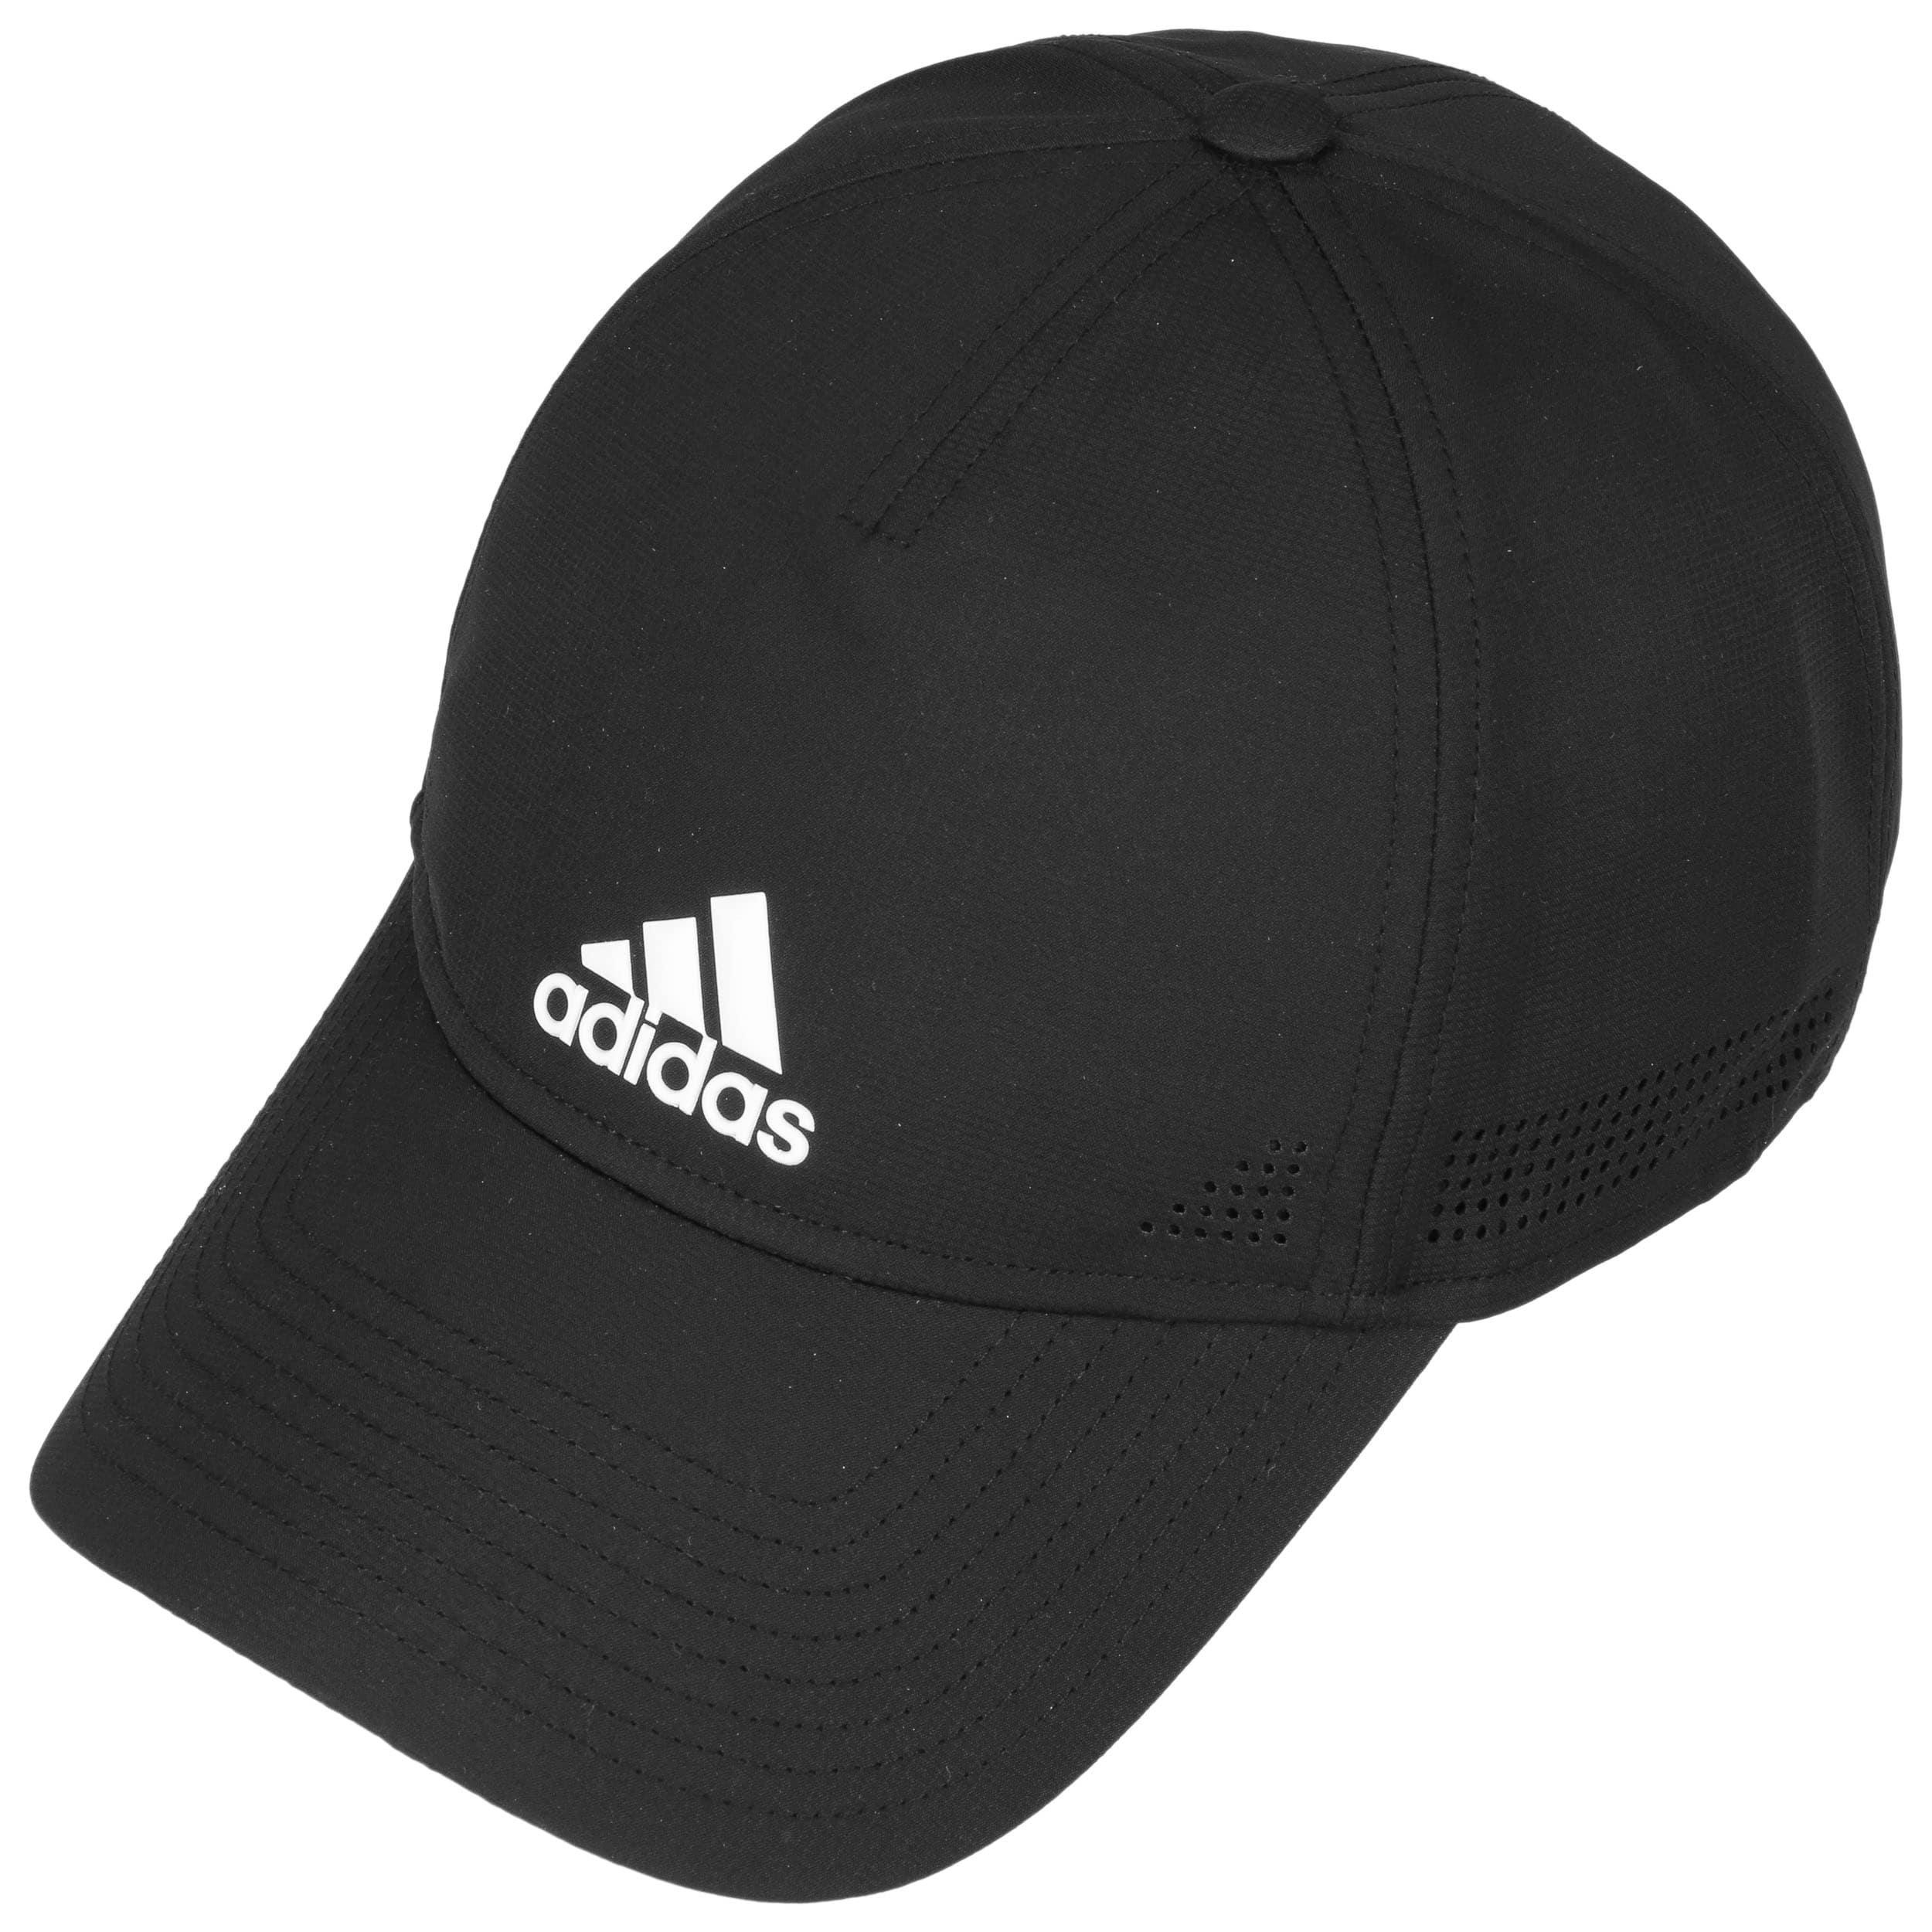 Adidas cap online shopping